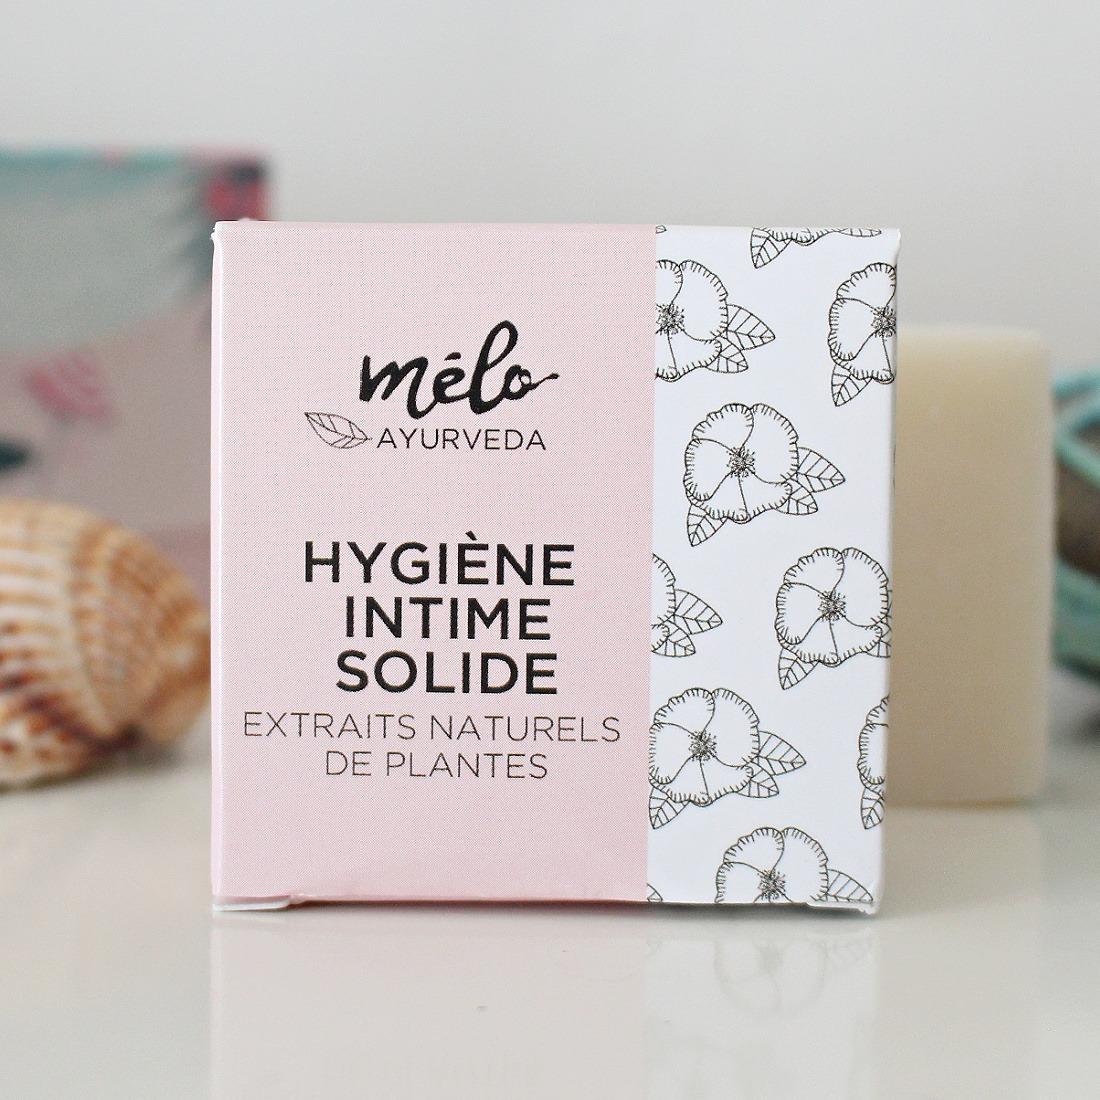 soin solide hygiène intime